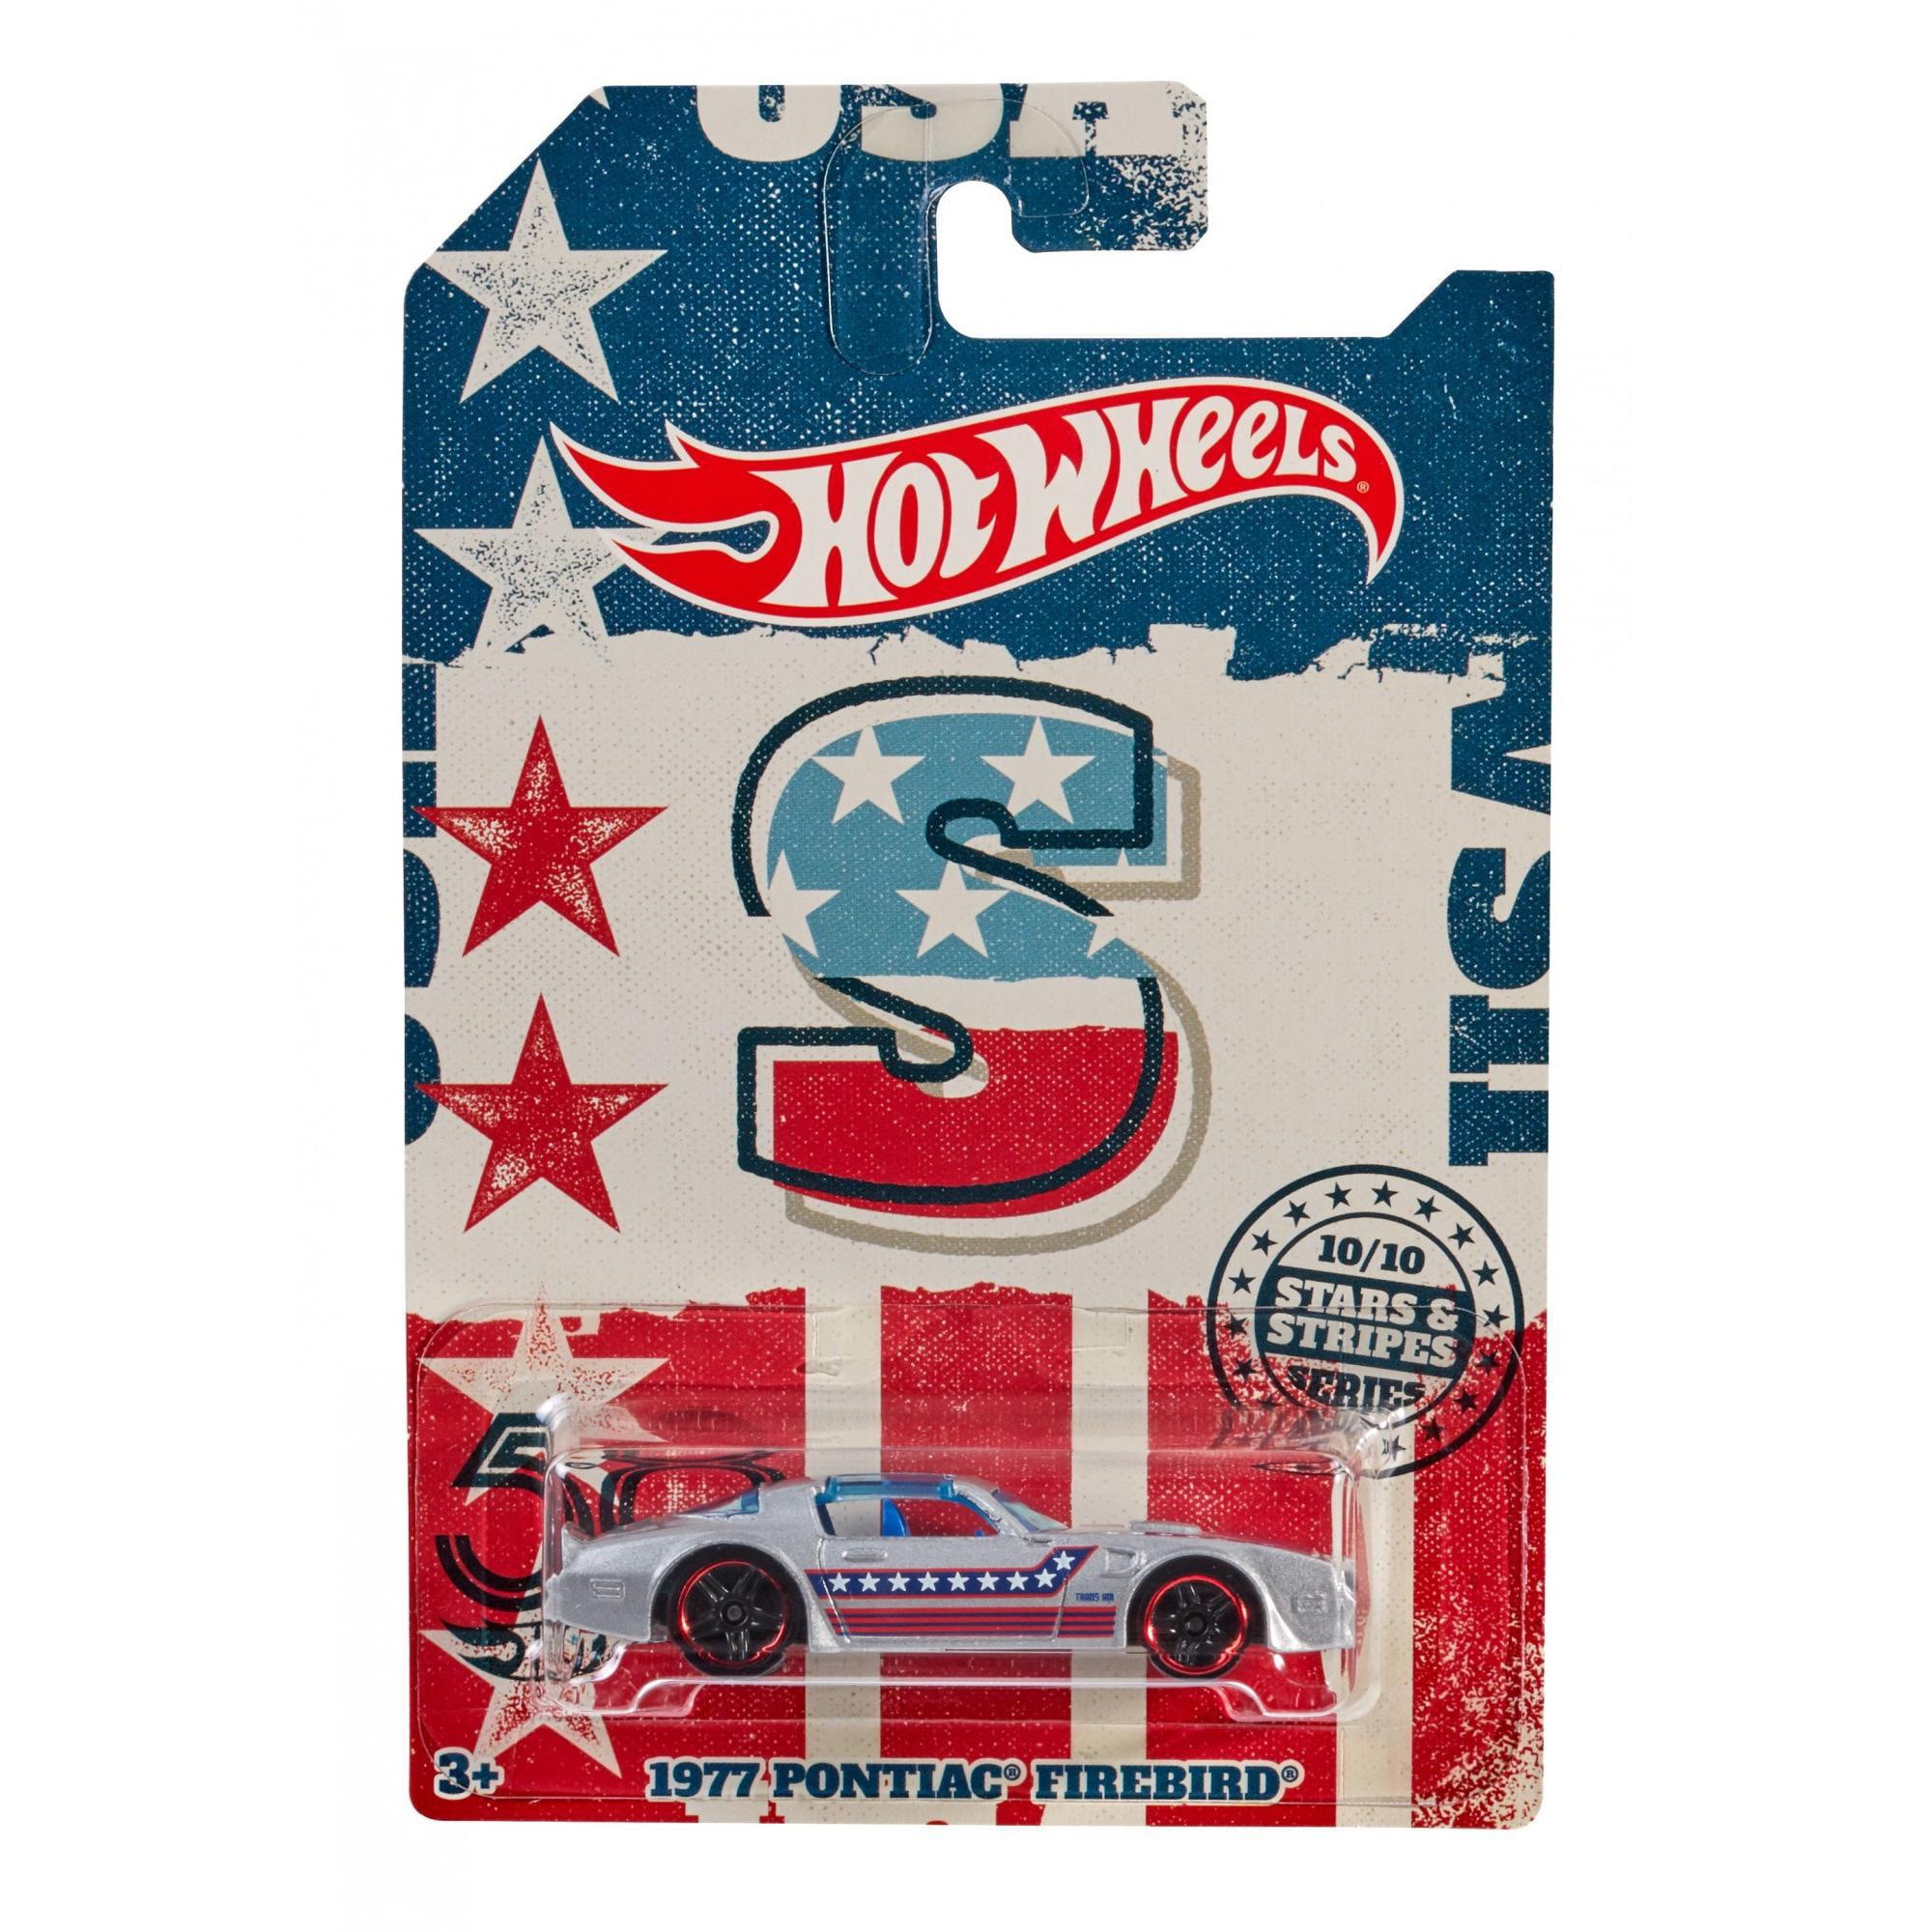 Hot Wheels Premium Vehicle (Styles May Vary) by Mattel